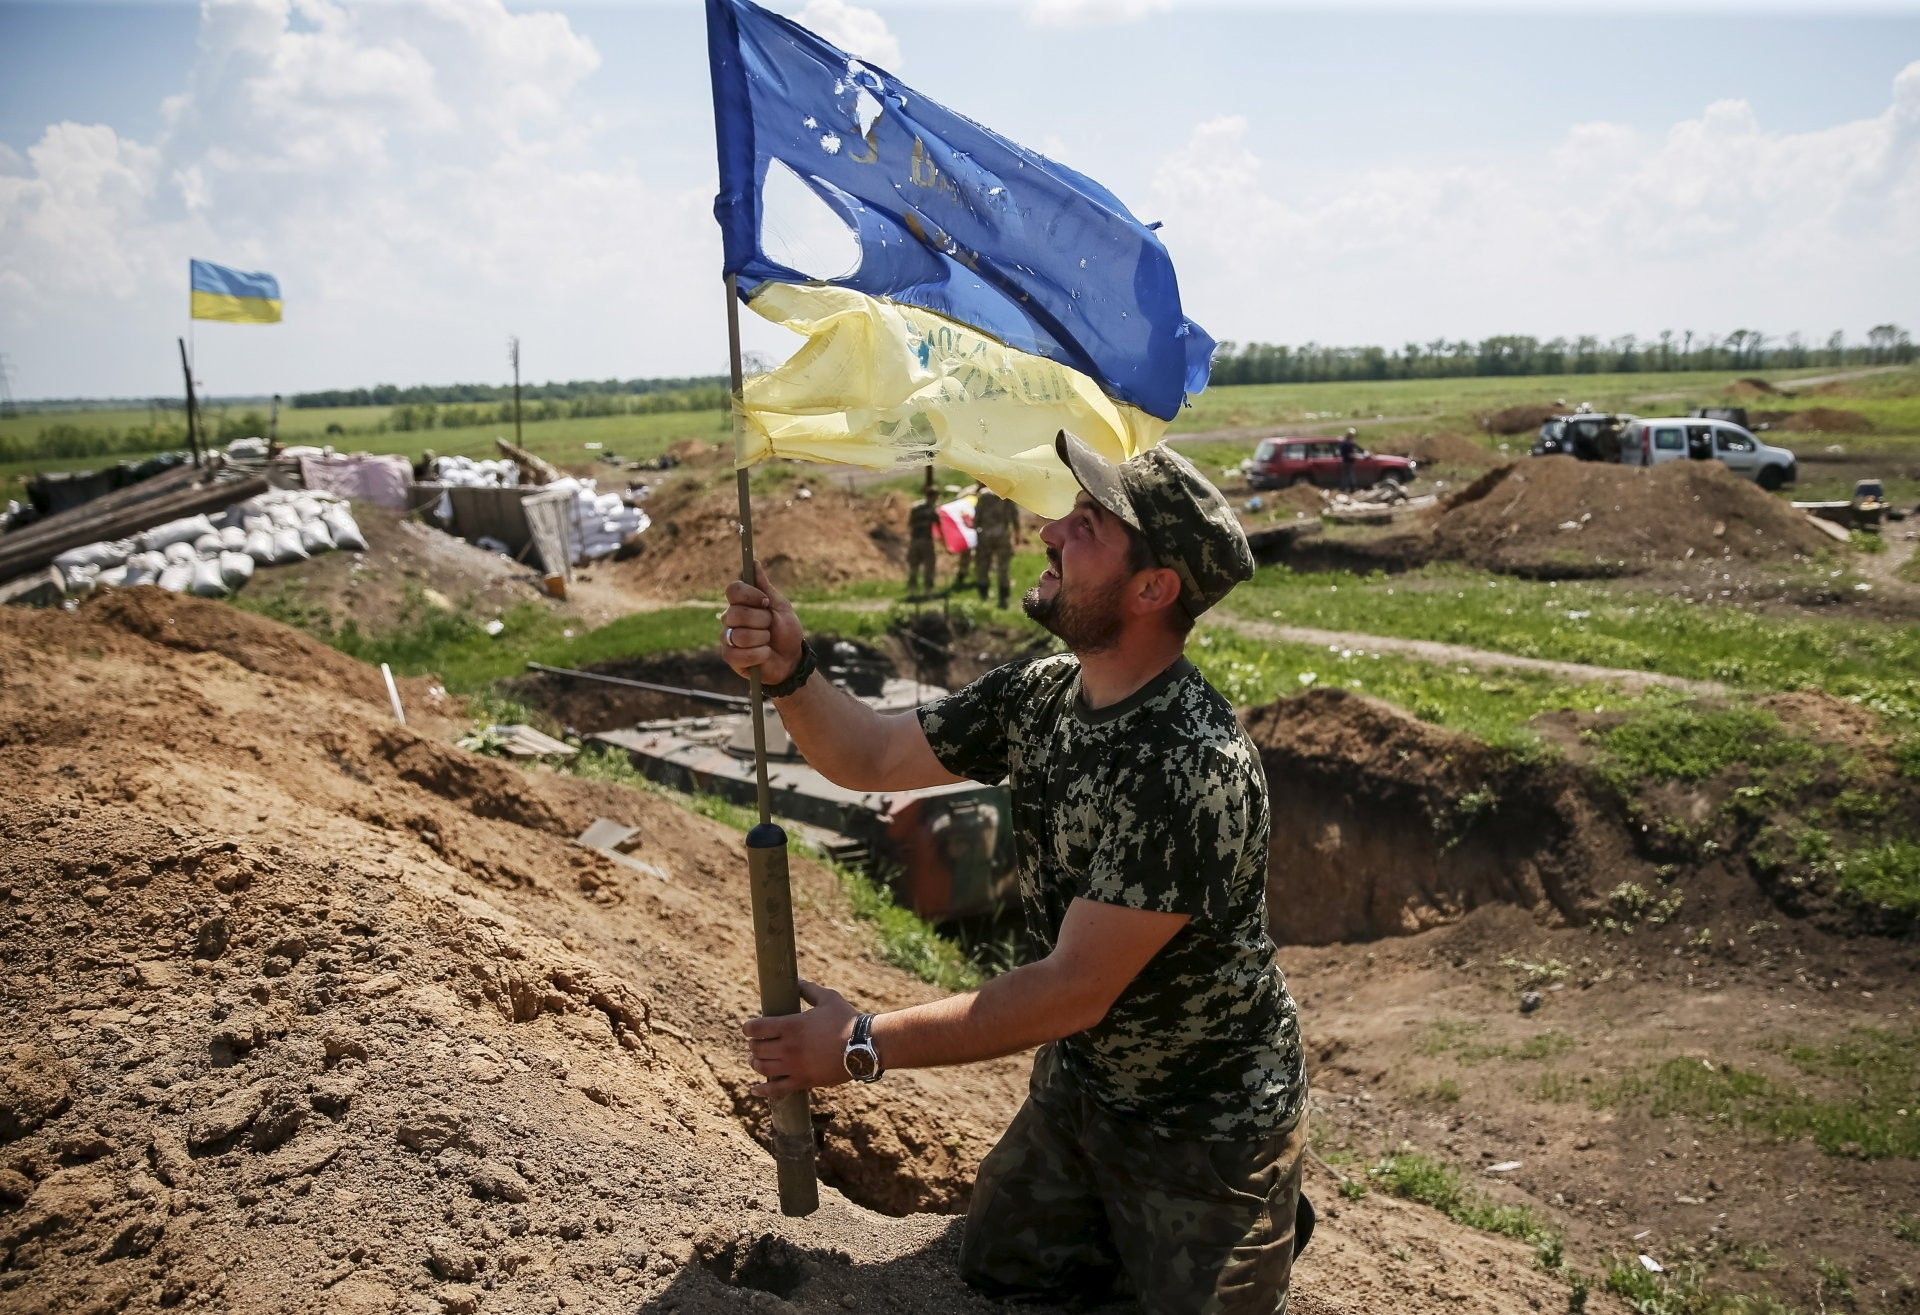 L'invasion Russe en Ukraine - Page 32 1464067048-5324.jpg?0